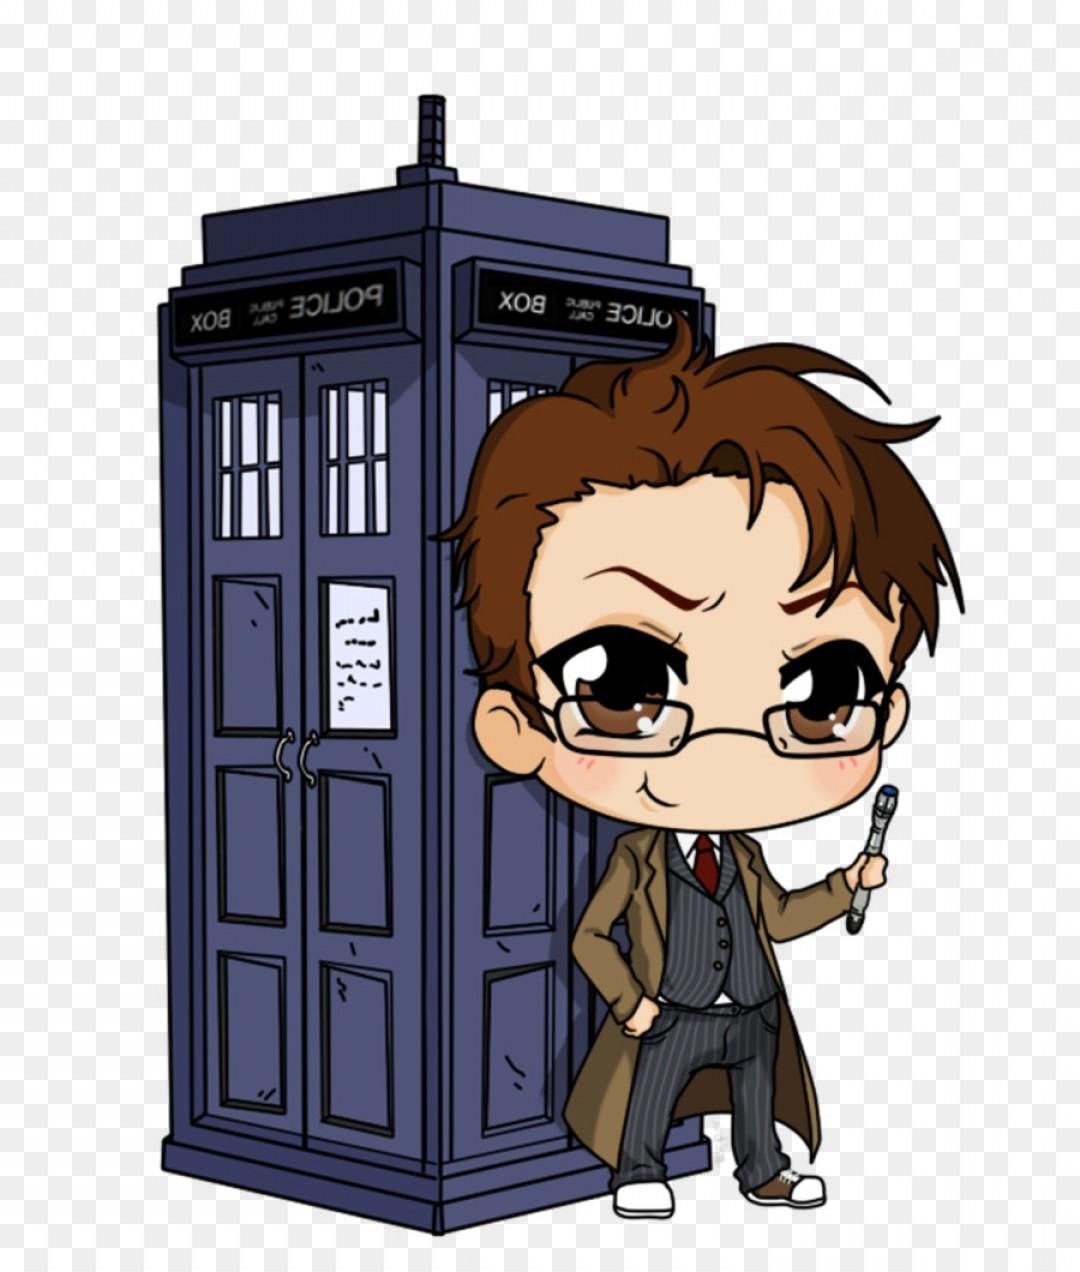 Seventh doctor clipart banner download Png Eleventh Doctor Seventh Doctor Tenth Doctor Ninth | SOIDERGI banner download